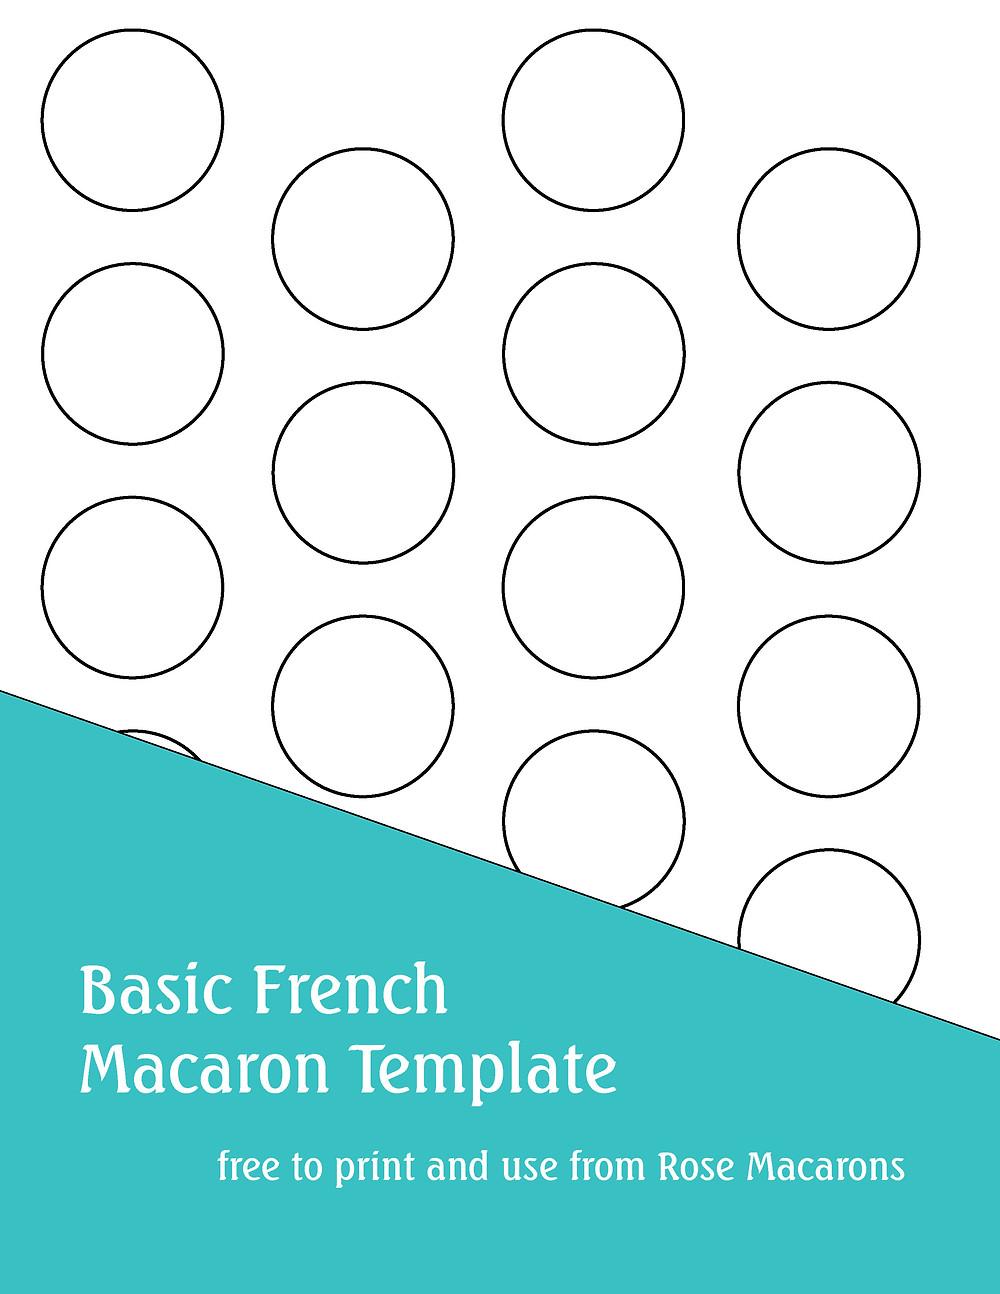 Basic French Macaron Template